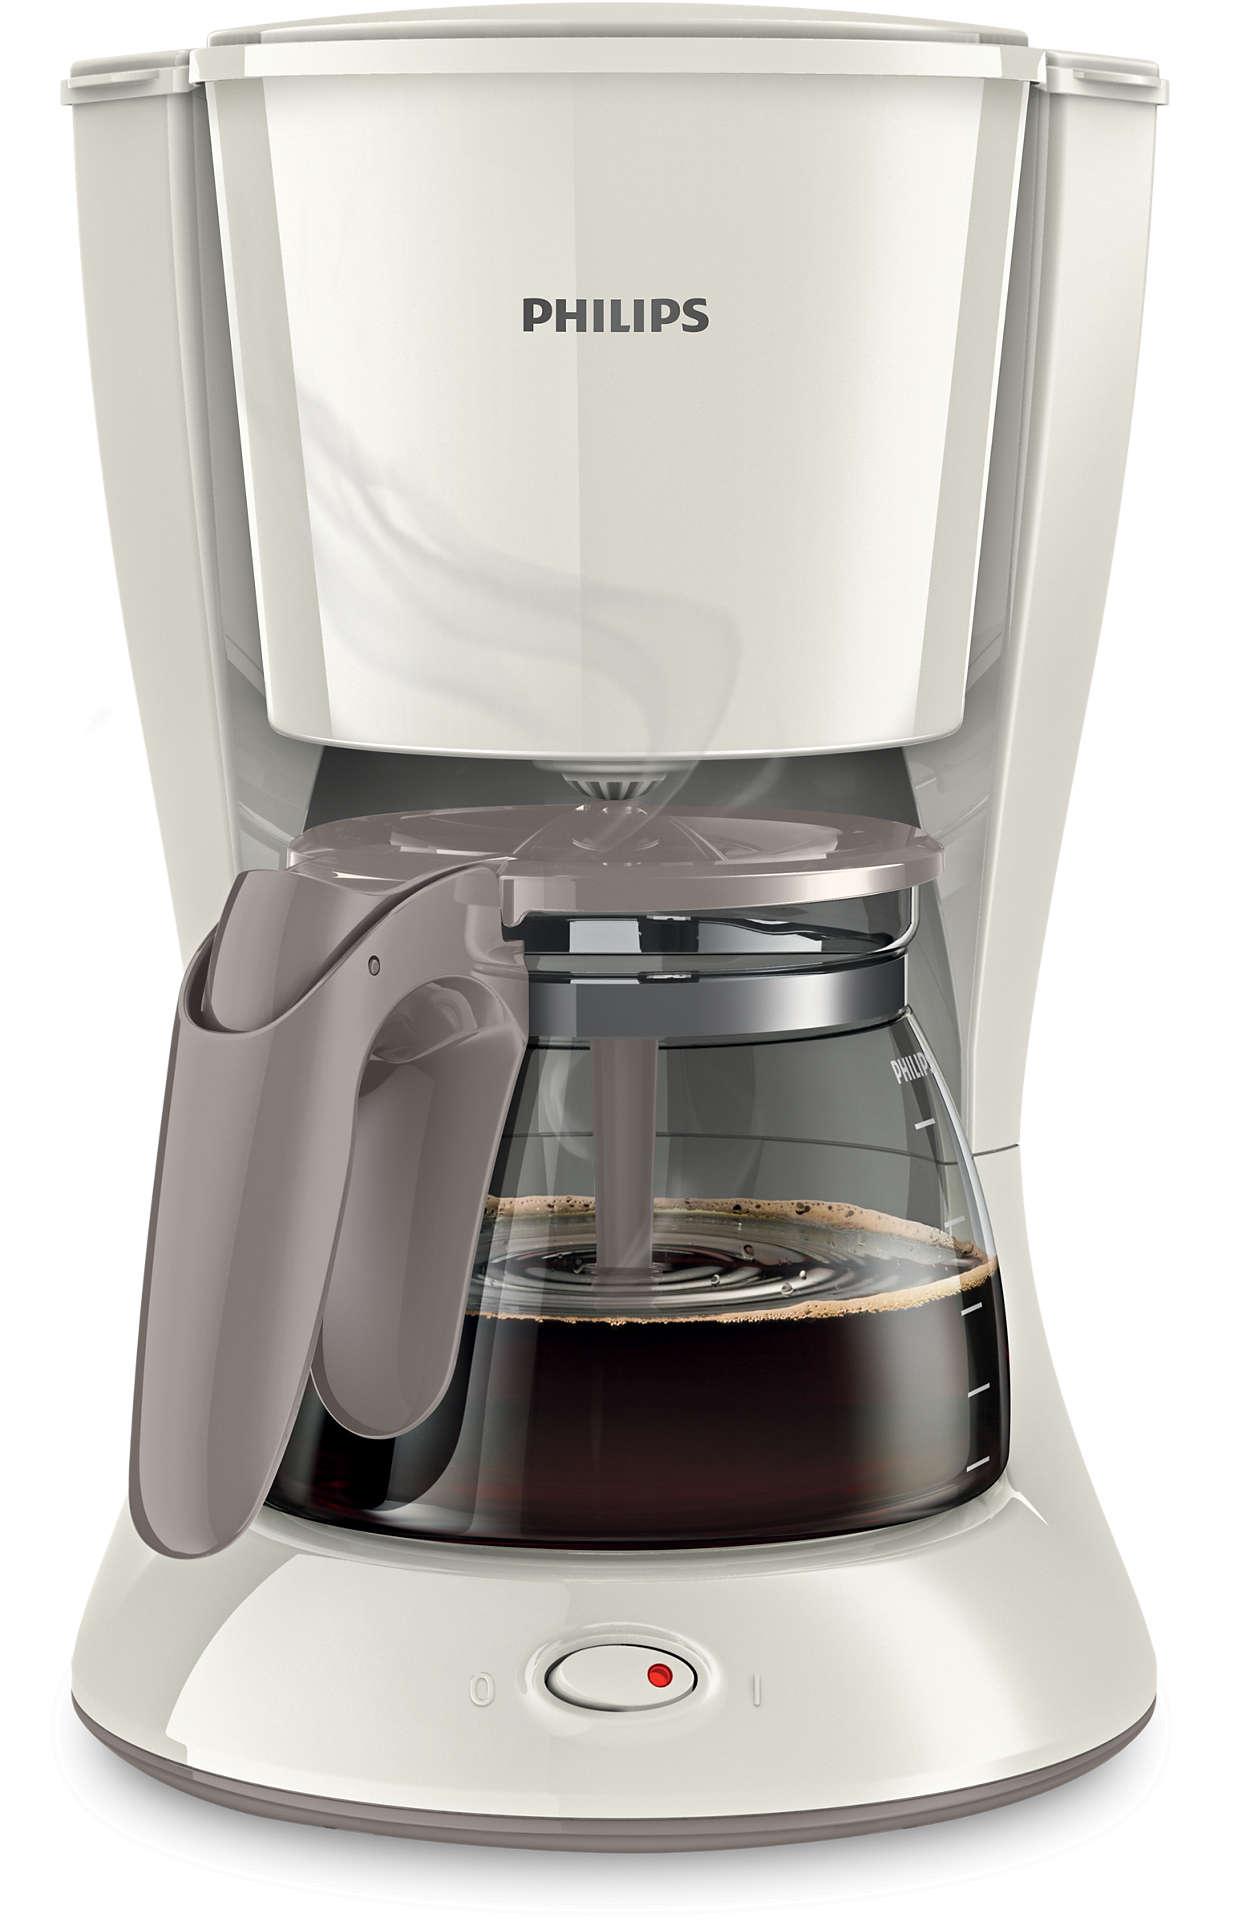 Tiesiog skani kava